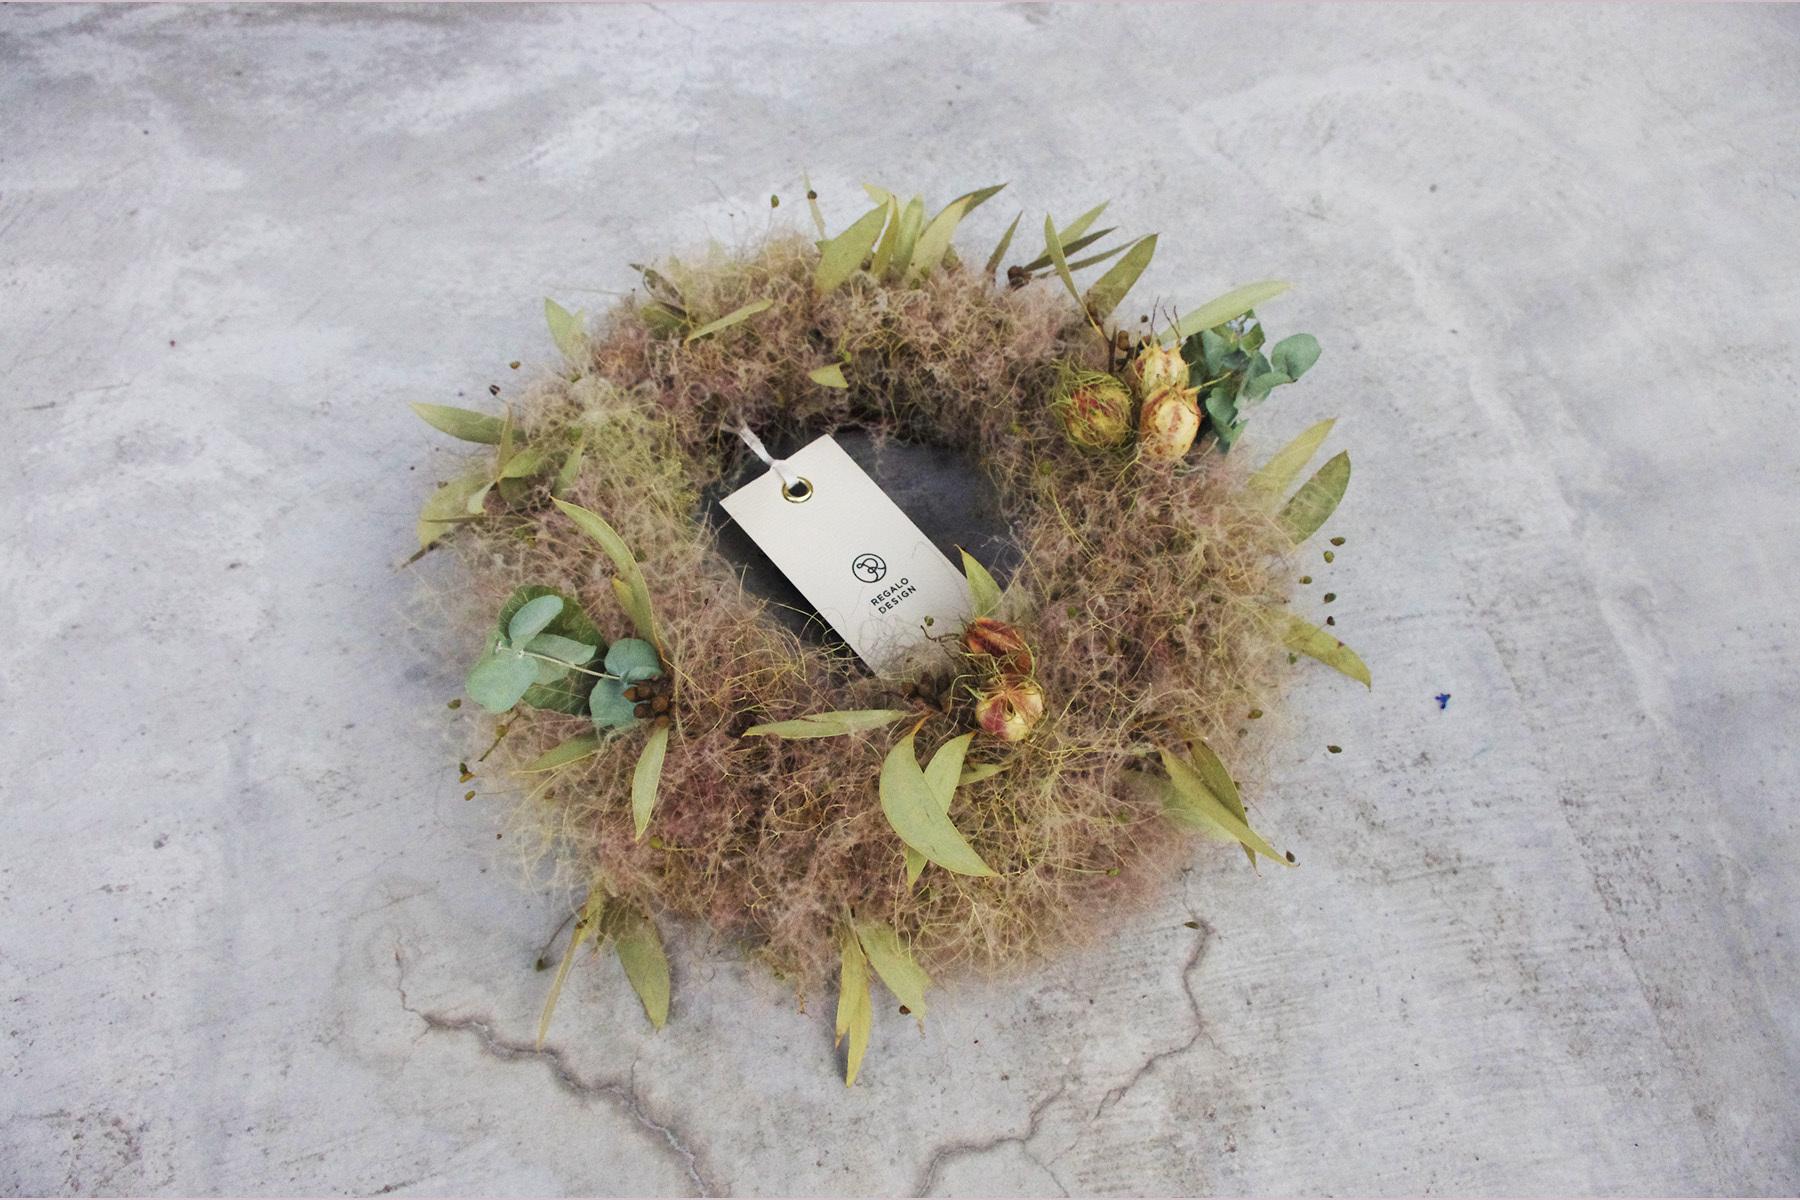 Smoketree wreathe | スモークツリーリース